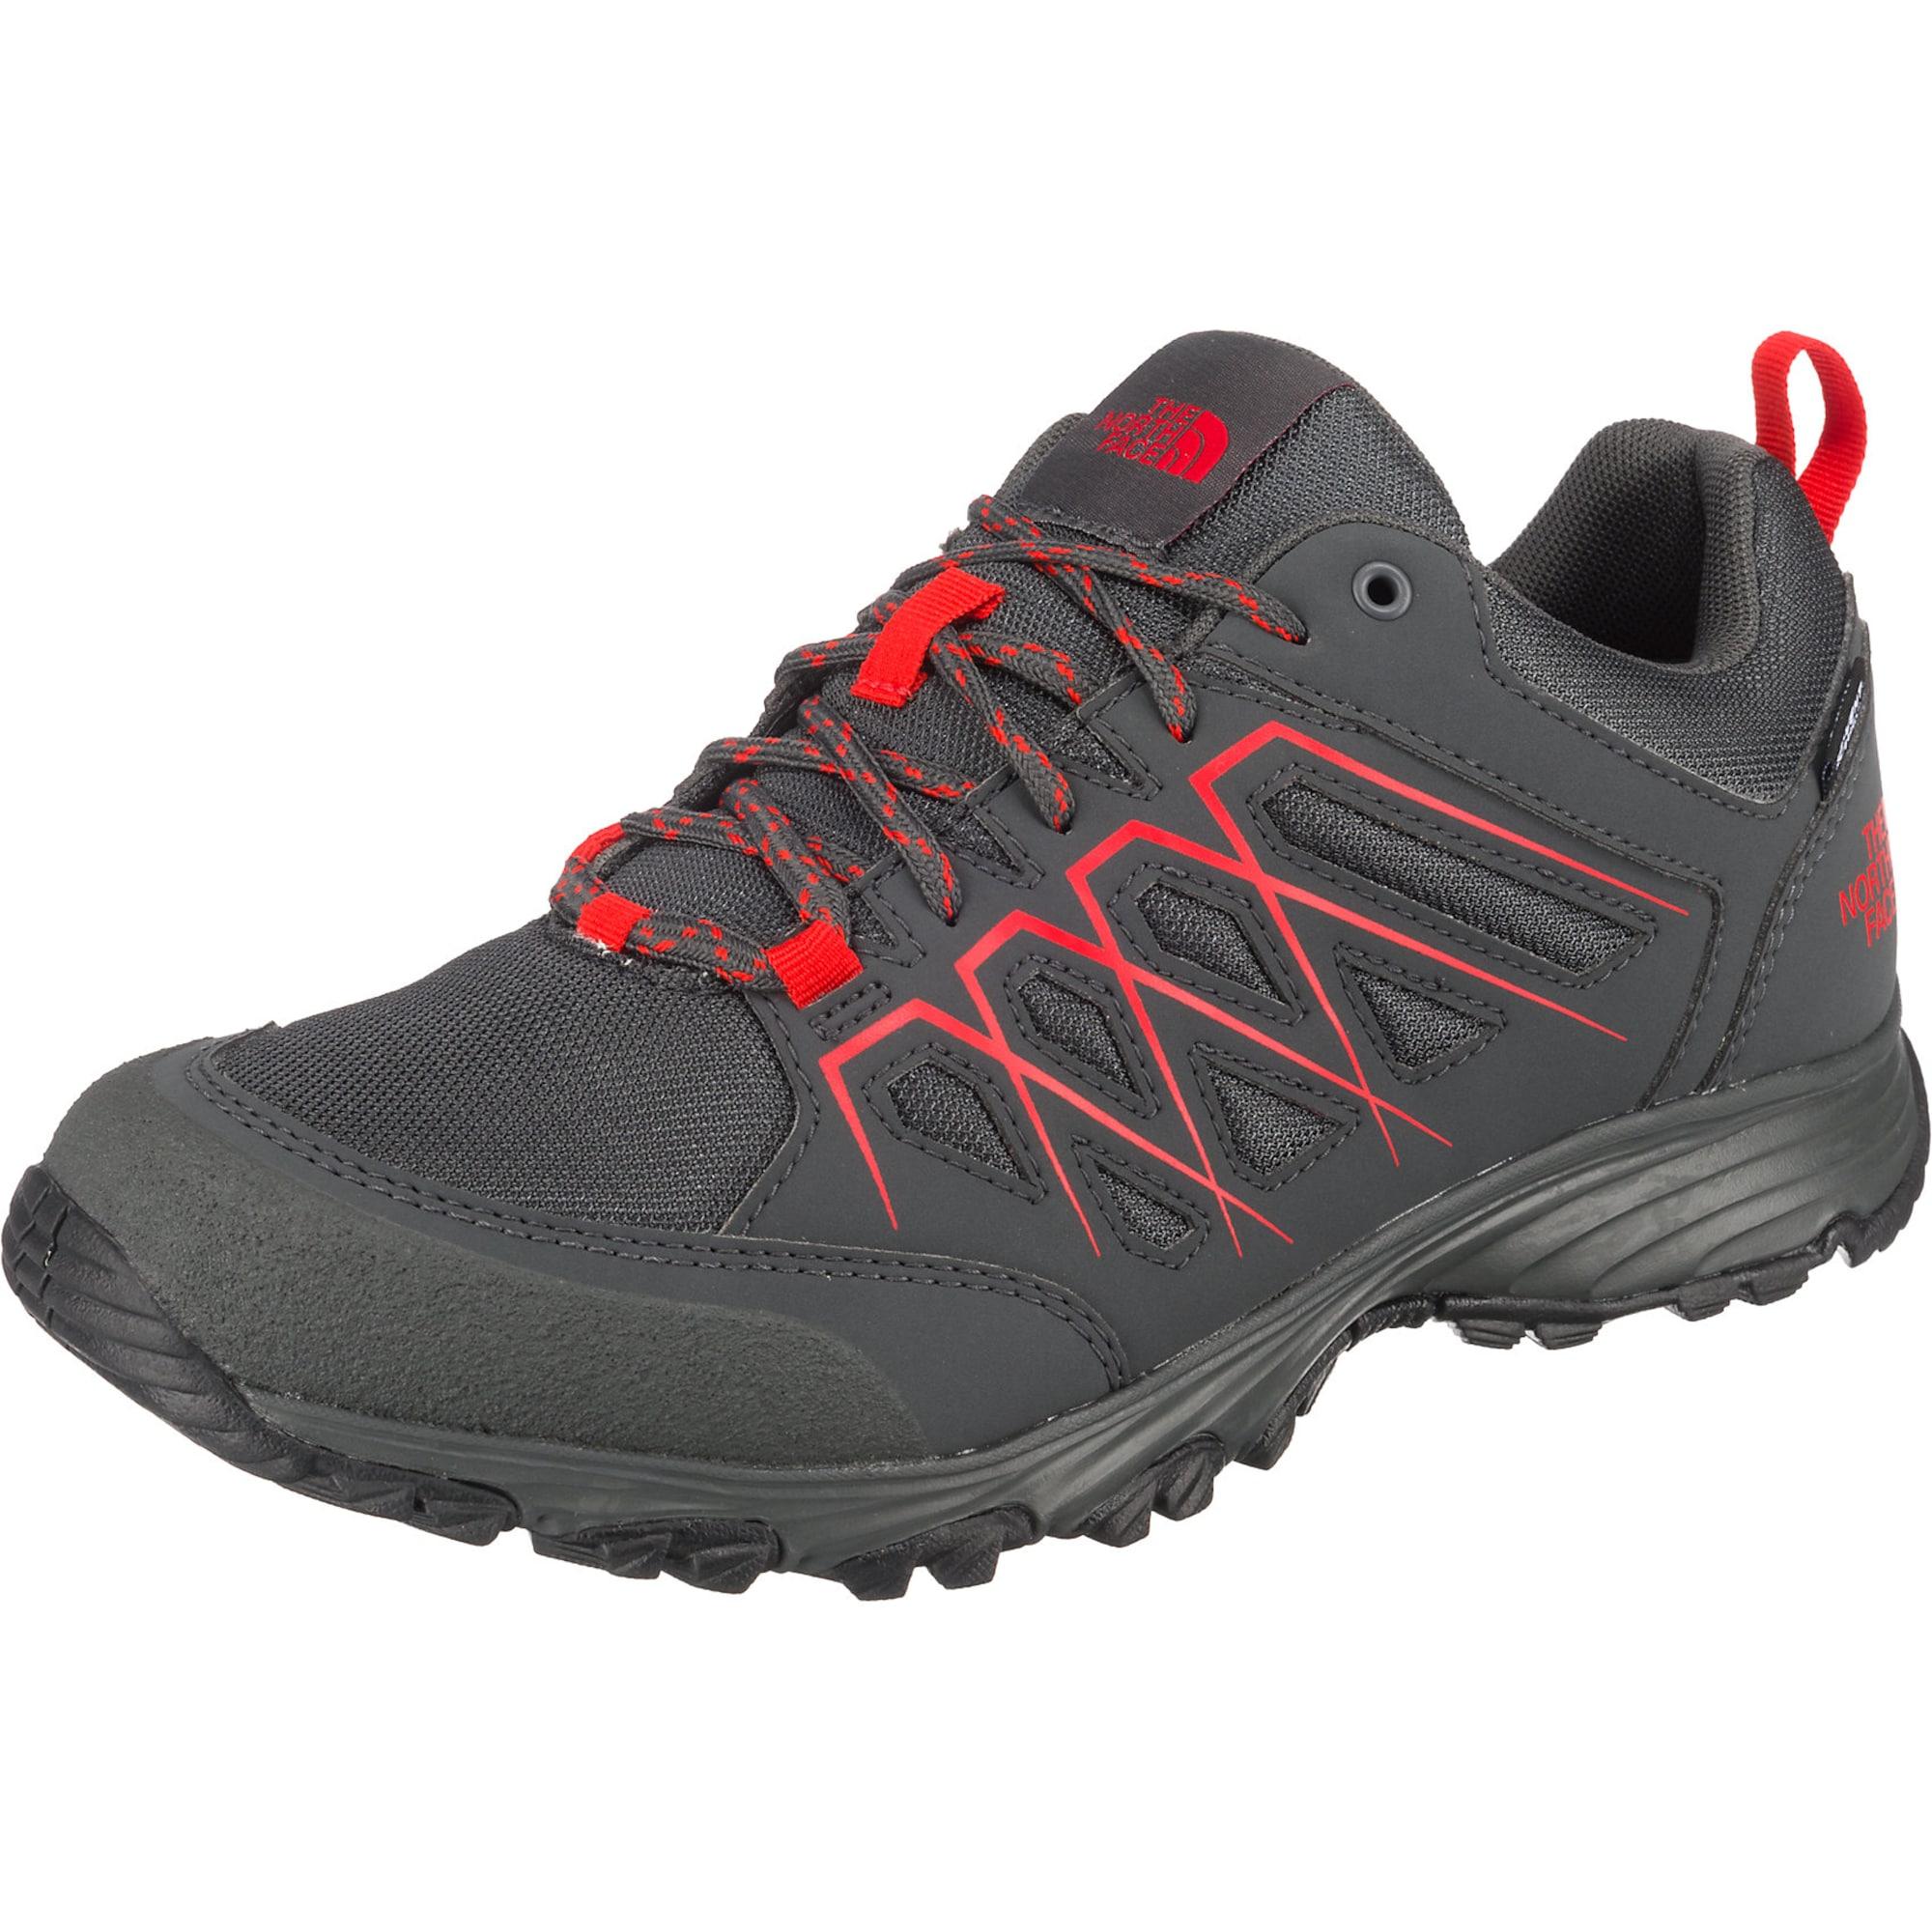 Schuhe 'Venture Fasthike Wp' | Schuhe > Outdoorschuhe > Kletterschuhe | The North Face